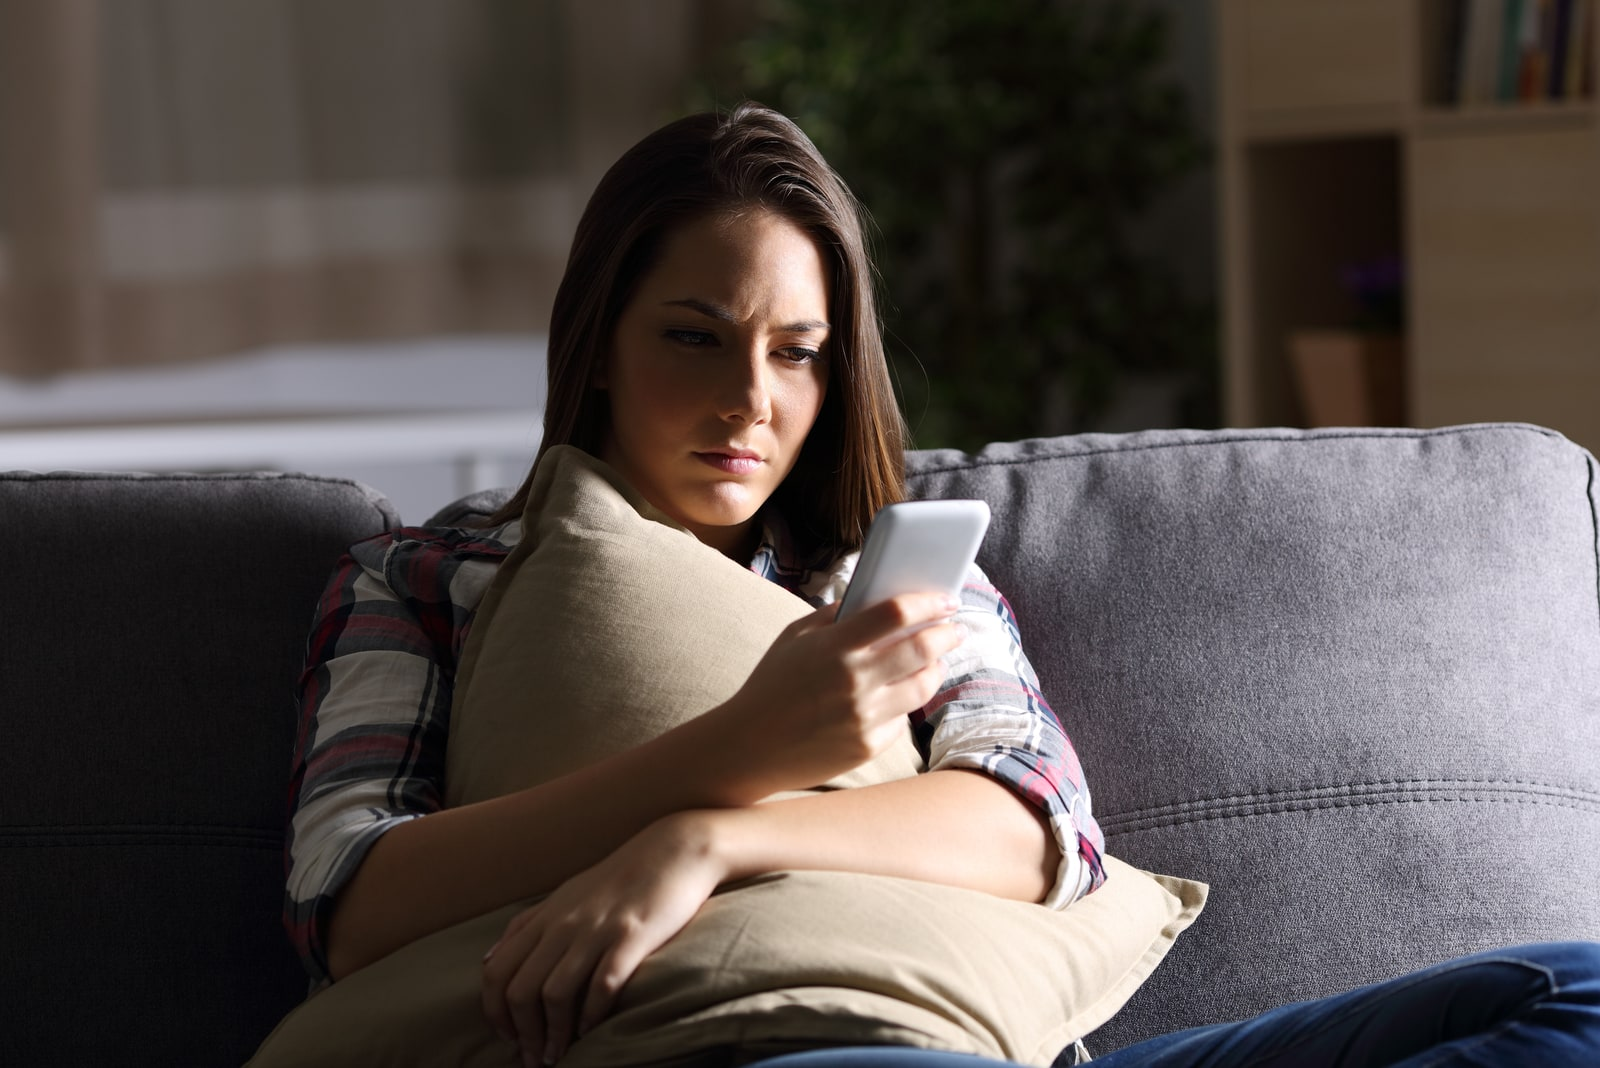 worried woman looking at phone